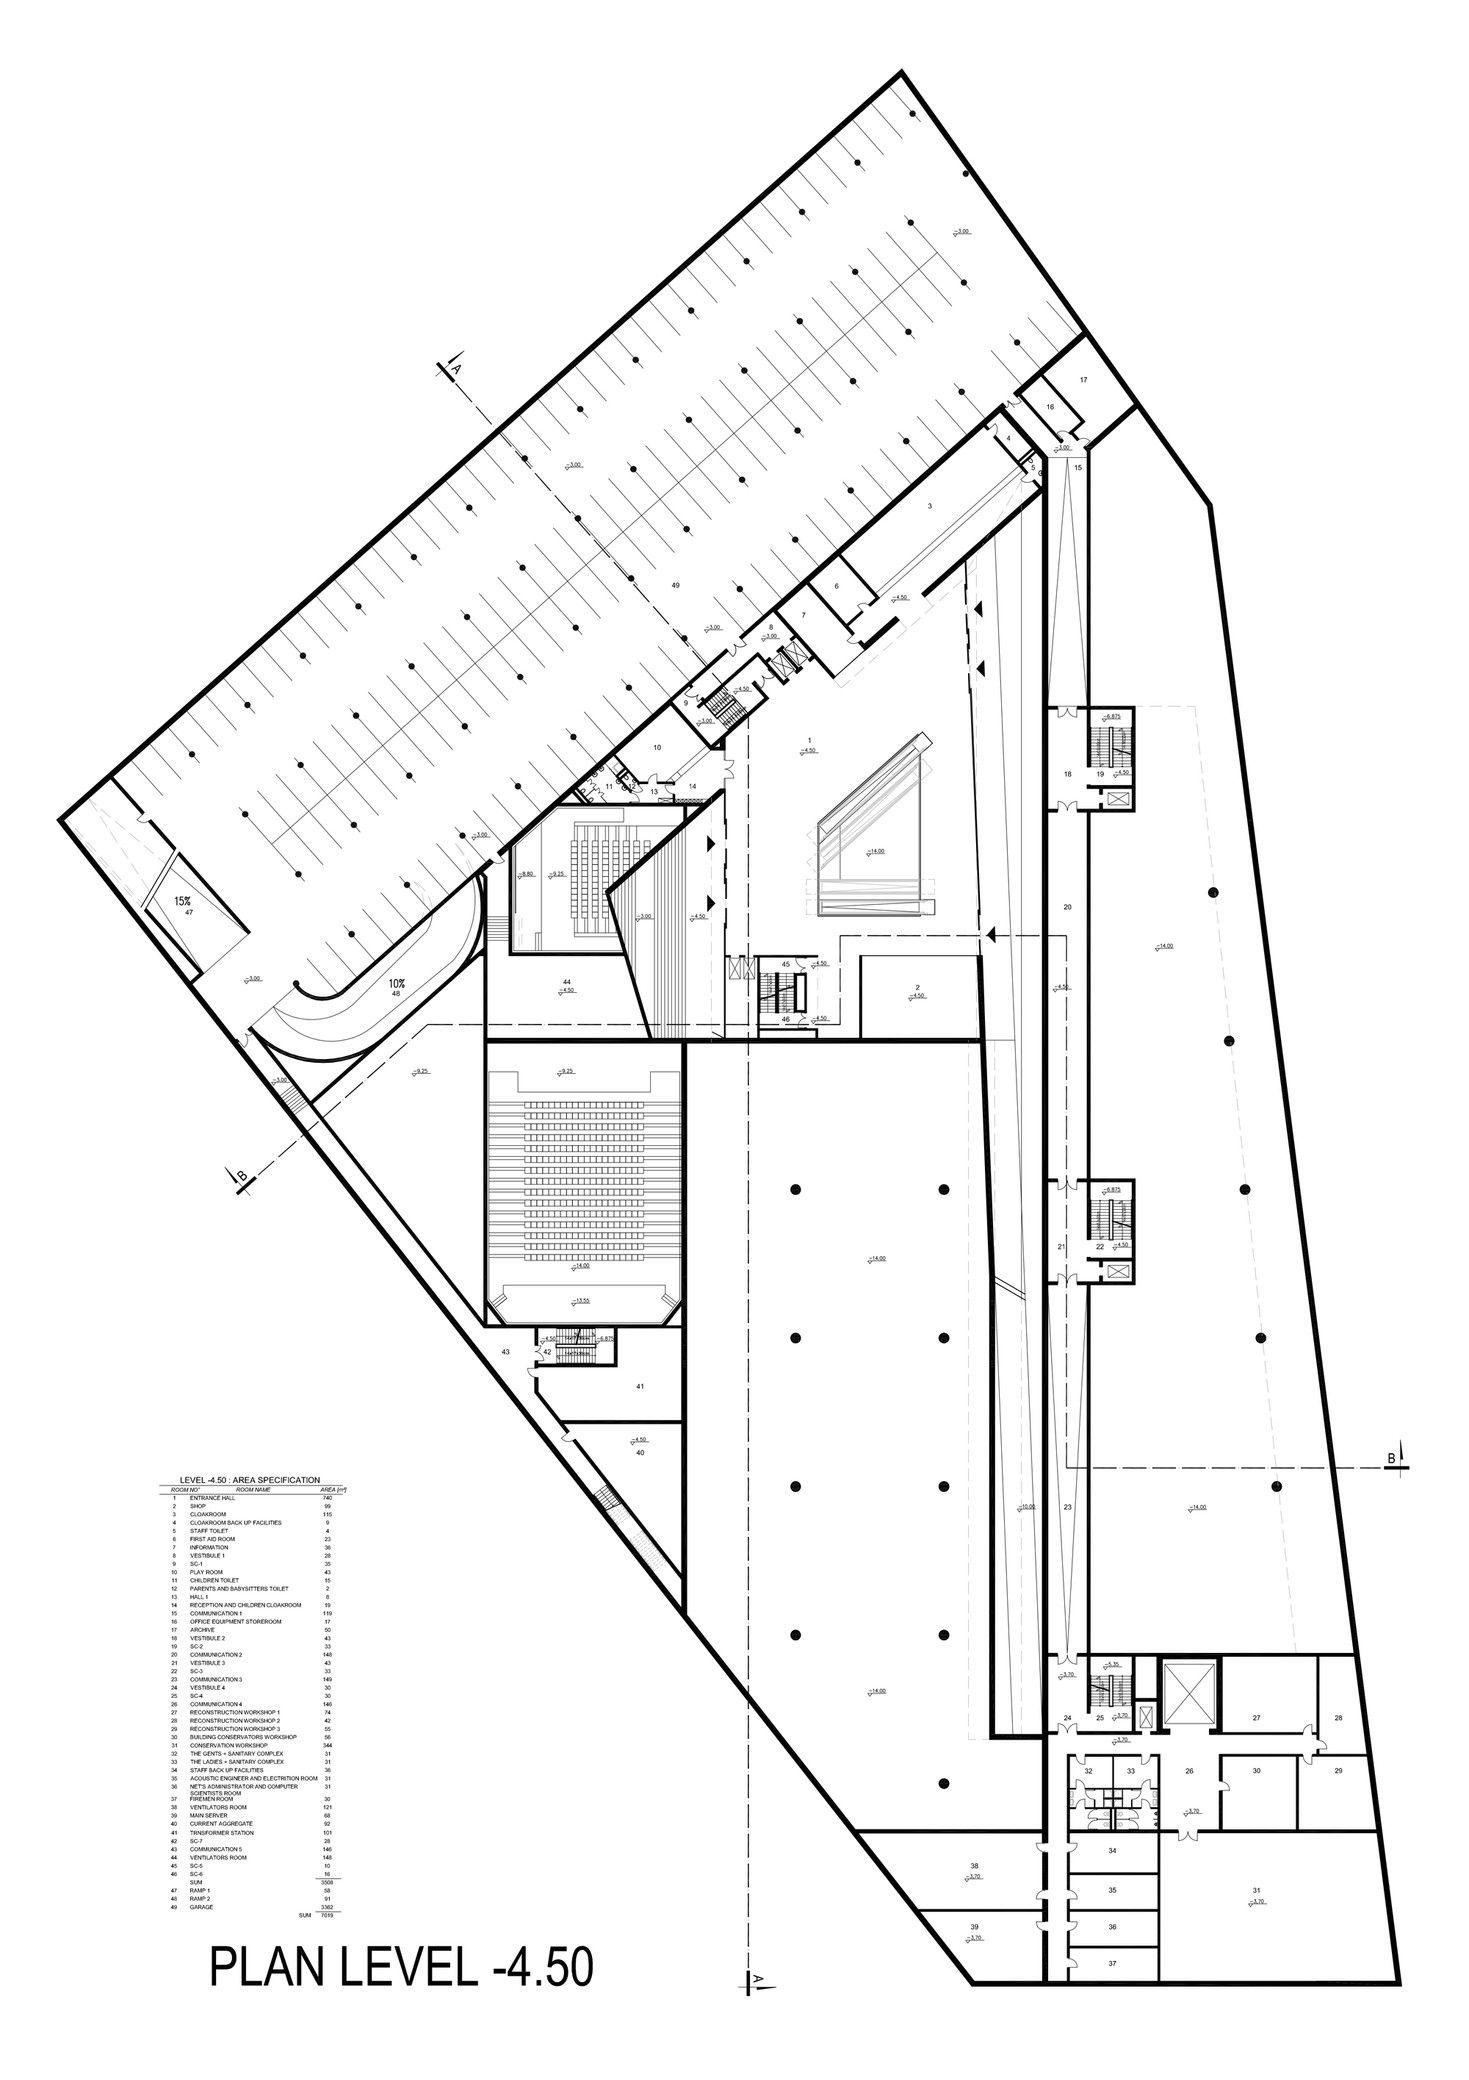 Museum Of The Second World War Studio Architektoniczne Kwadrat Arch2o Com World War Two Museum Architecture Museum Plan